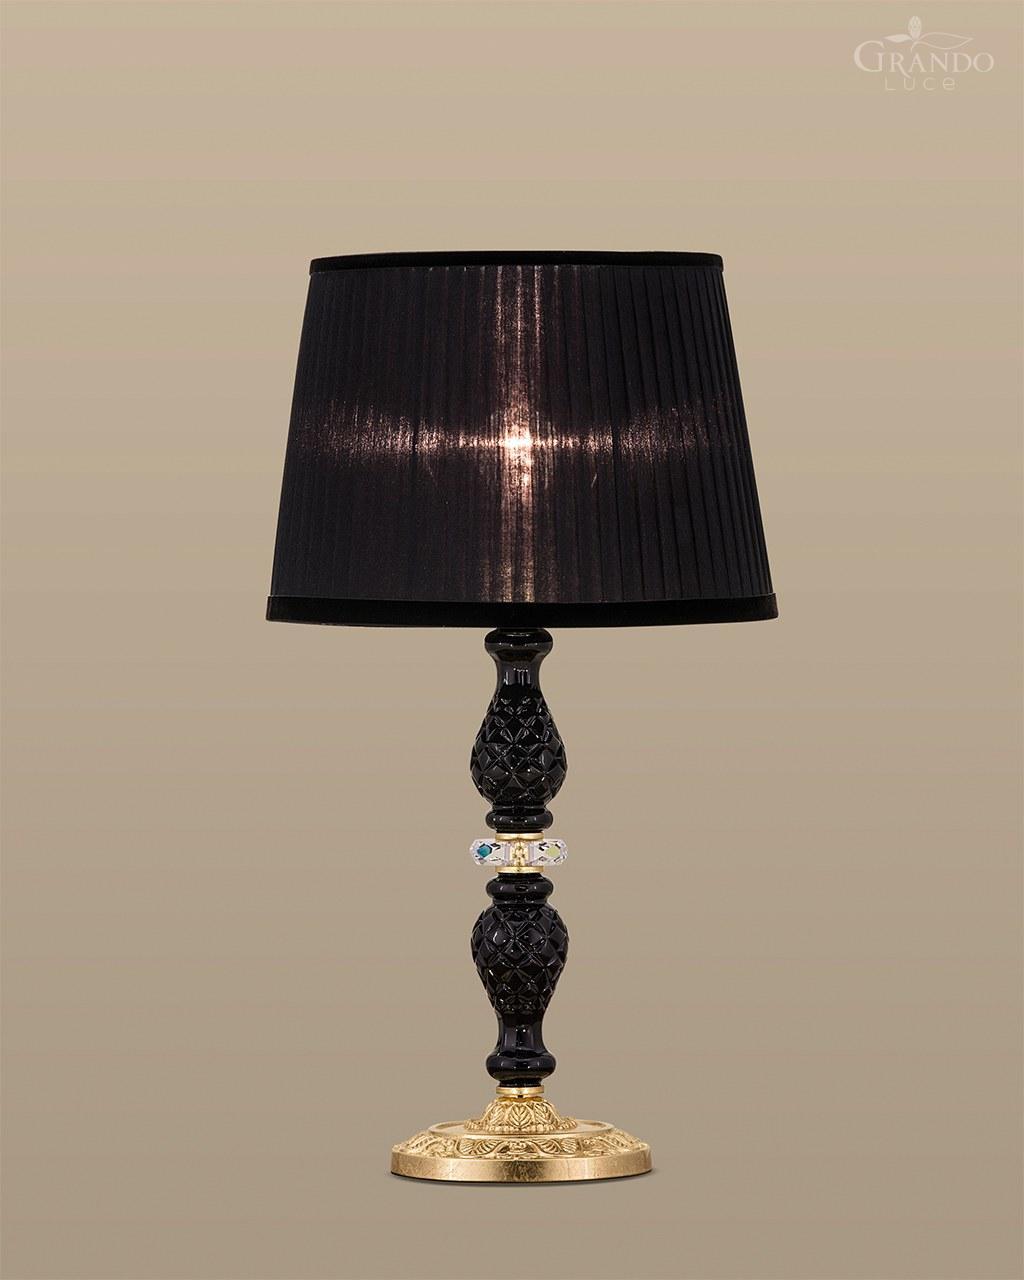 105 Lm Gold Leaf Black Crystal Table Lamp Organdy